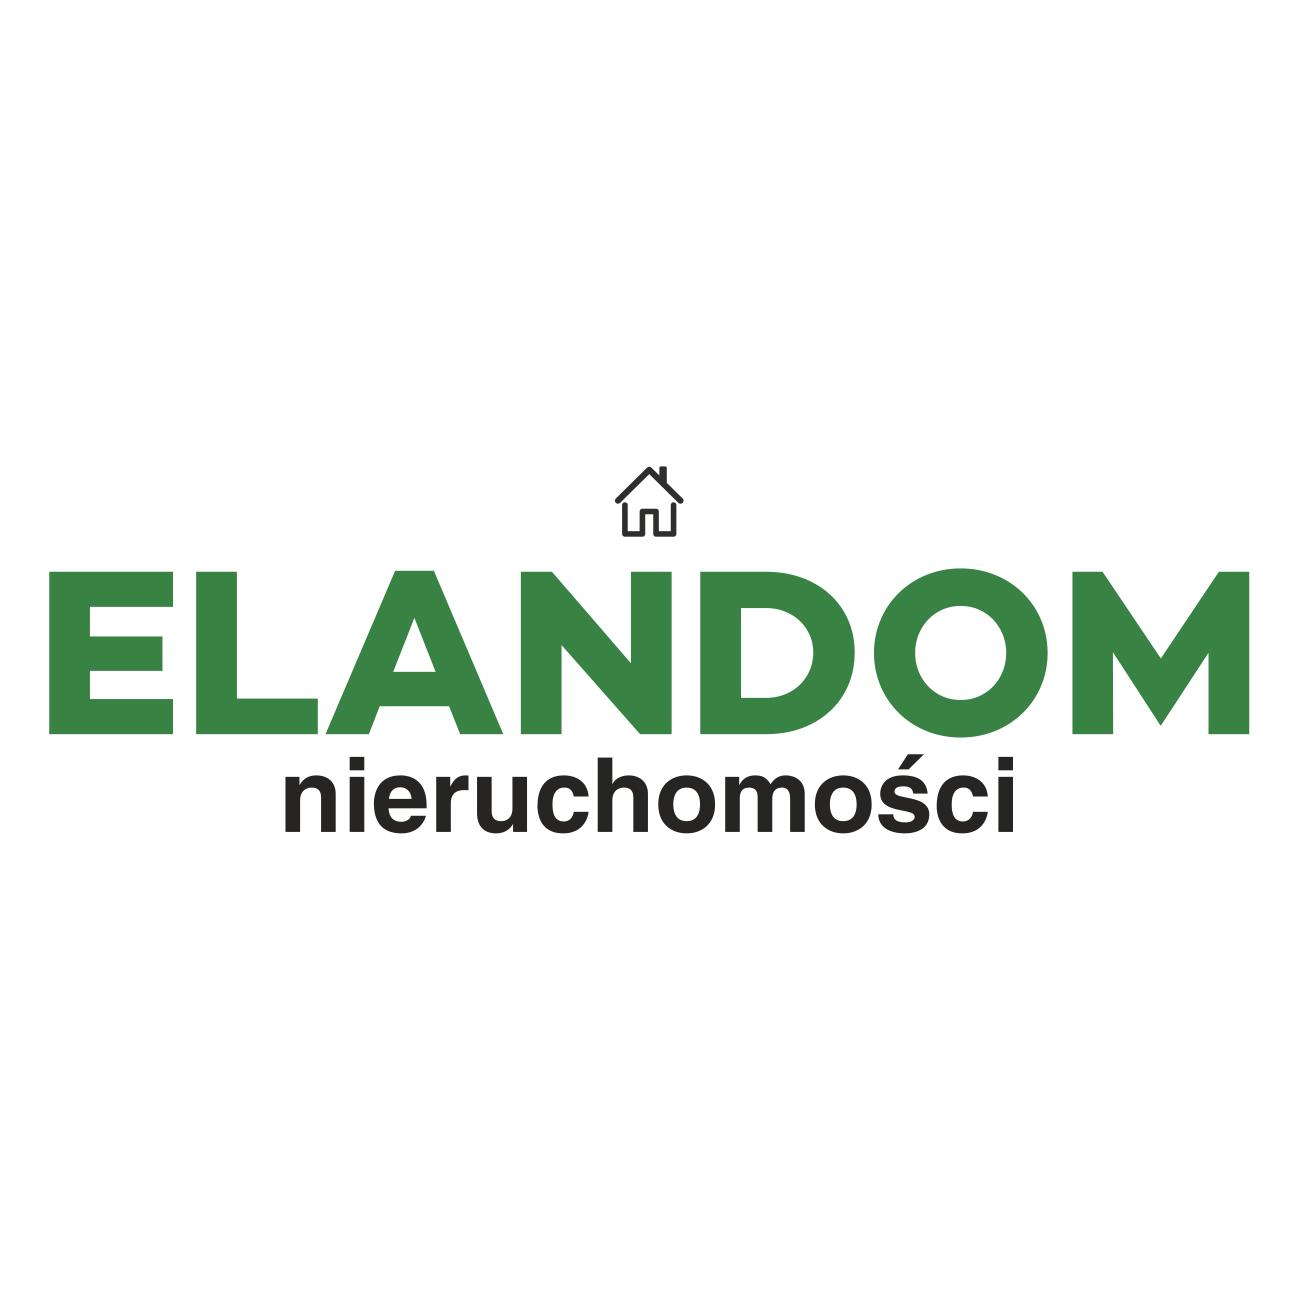 ELANDOM